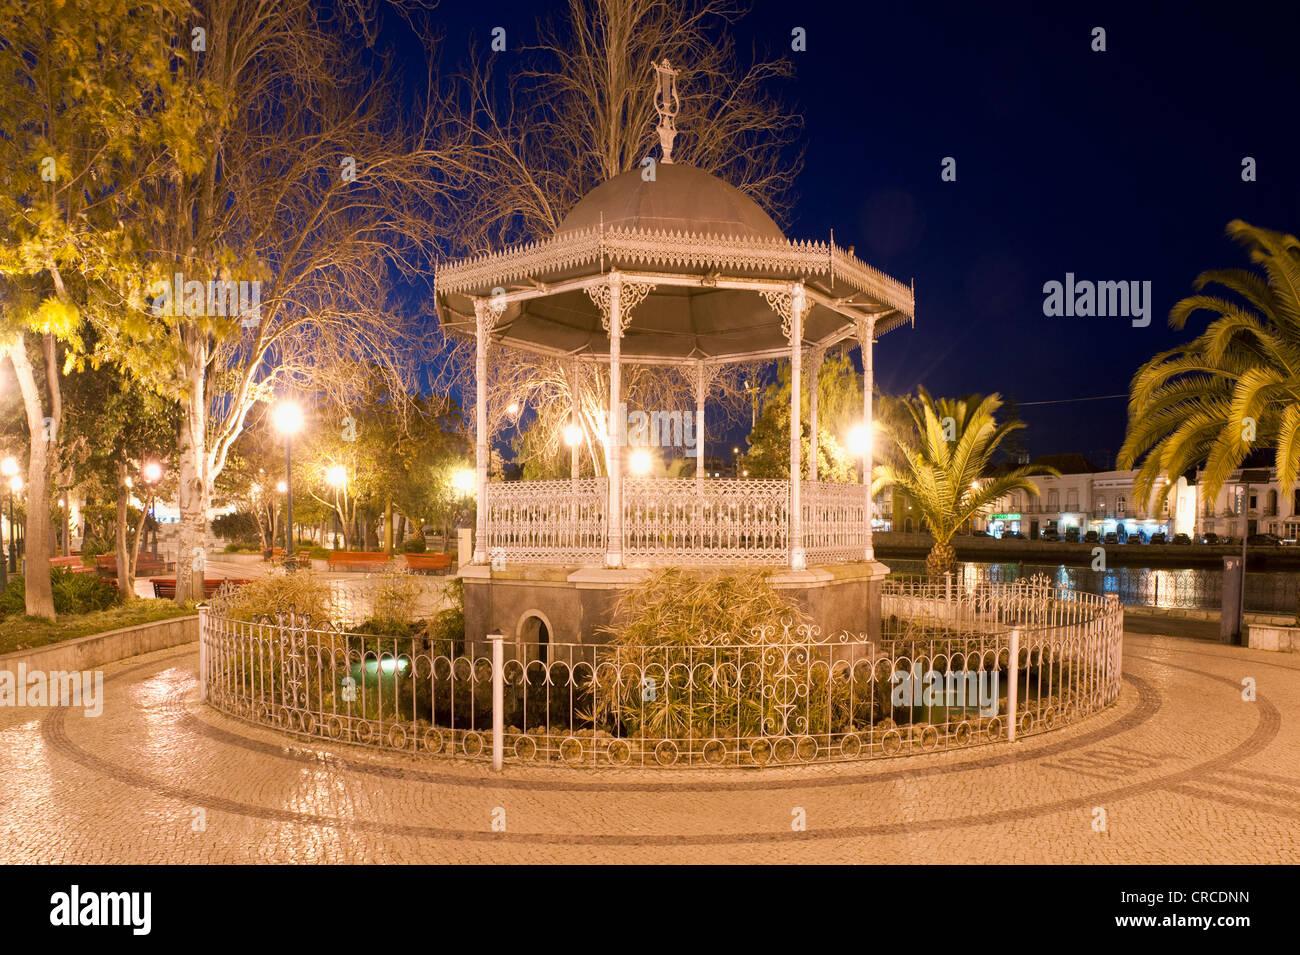 Bandstand at sunset, Tavira, Algarve, Portugal - Stock Image